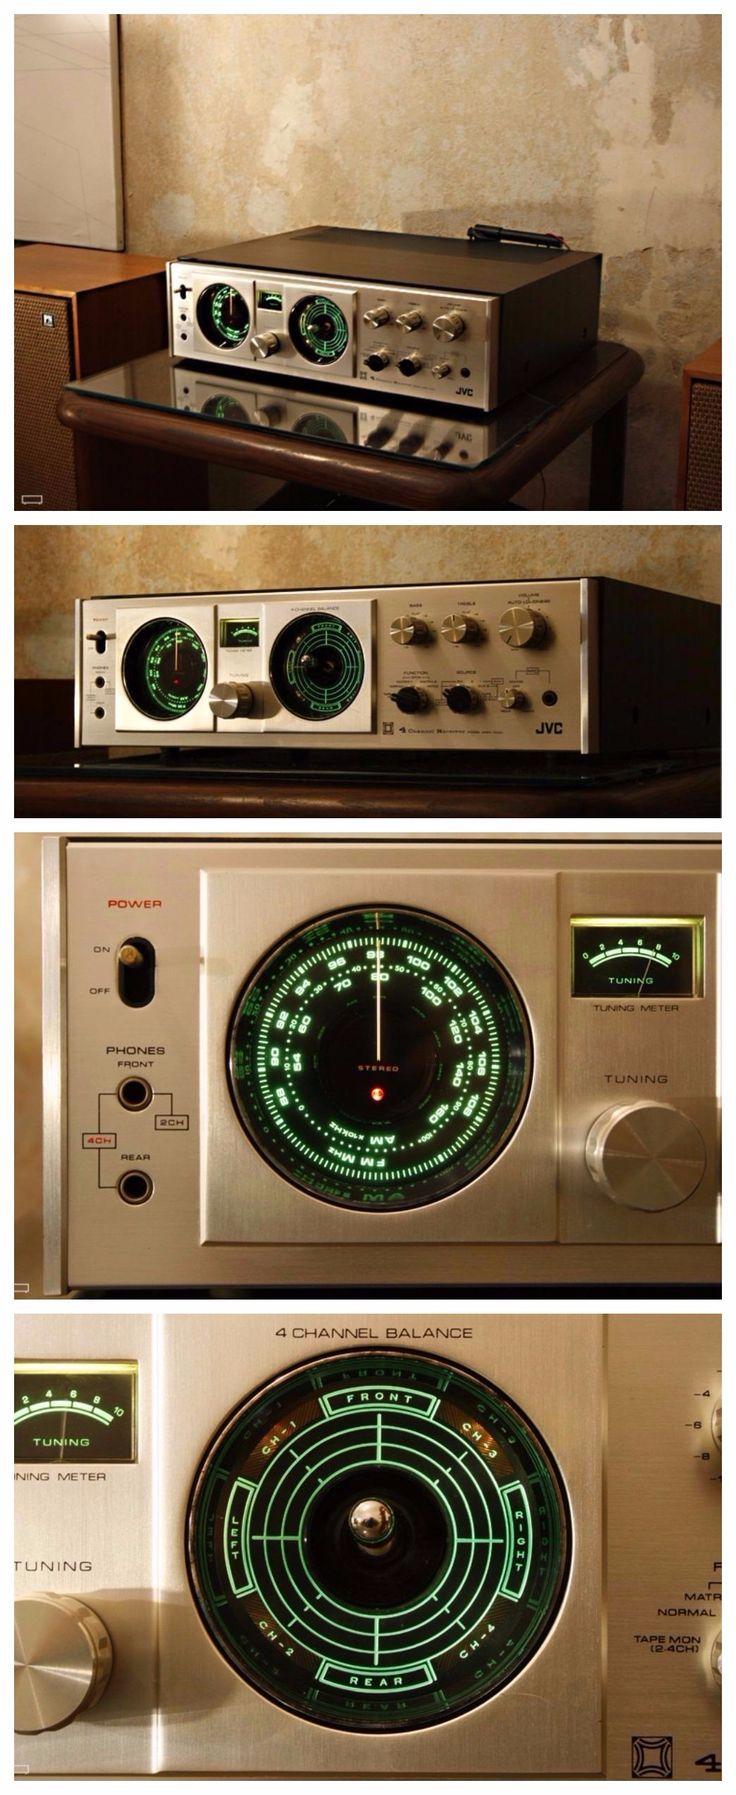 JVC 4MM1000 4-channel receiver - Phono, Aux 1, Aux 2, Tape, Tone Tuning range: FM, AM Power output: 40W/ch into 8 (quadraphonic) Frequency response: 20Hz to 50kHz Total harmonic distortion: 1% Input sensitivity: 0.26mV (mic), 3mV (MM), 120mV (DIN), 120mV (line) Signal to noise ratio: 65dB (MM), 70dB (line) Output: 100mV (line), 30mV (DIN) Speaker load impedance: 8 (minimum) Semiconductors: 1 x FET, 4 x IC, 34 x transistors, 20 x diodes Dimensions: 149 x 464 x 450mm Weight: 12kg | pin by…